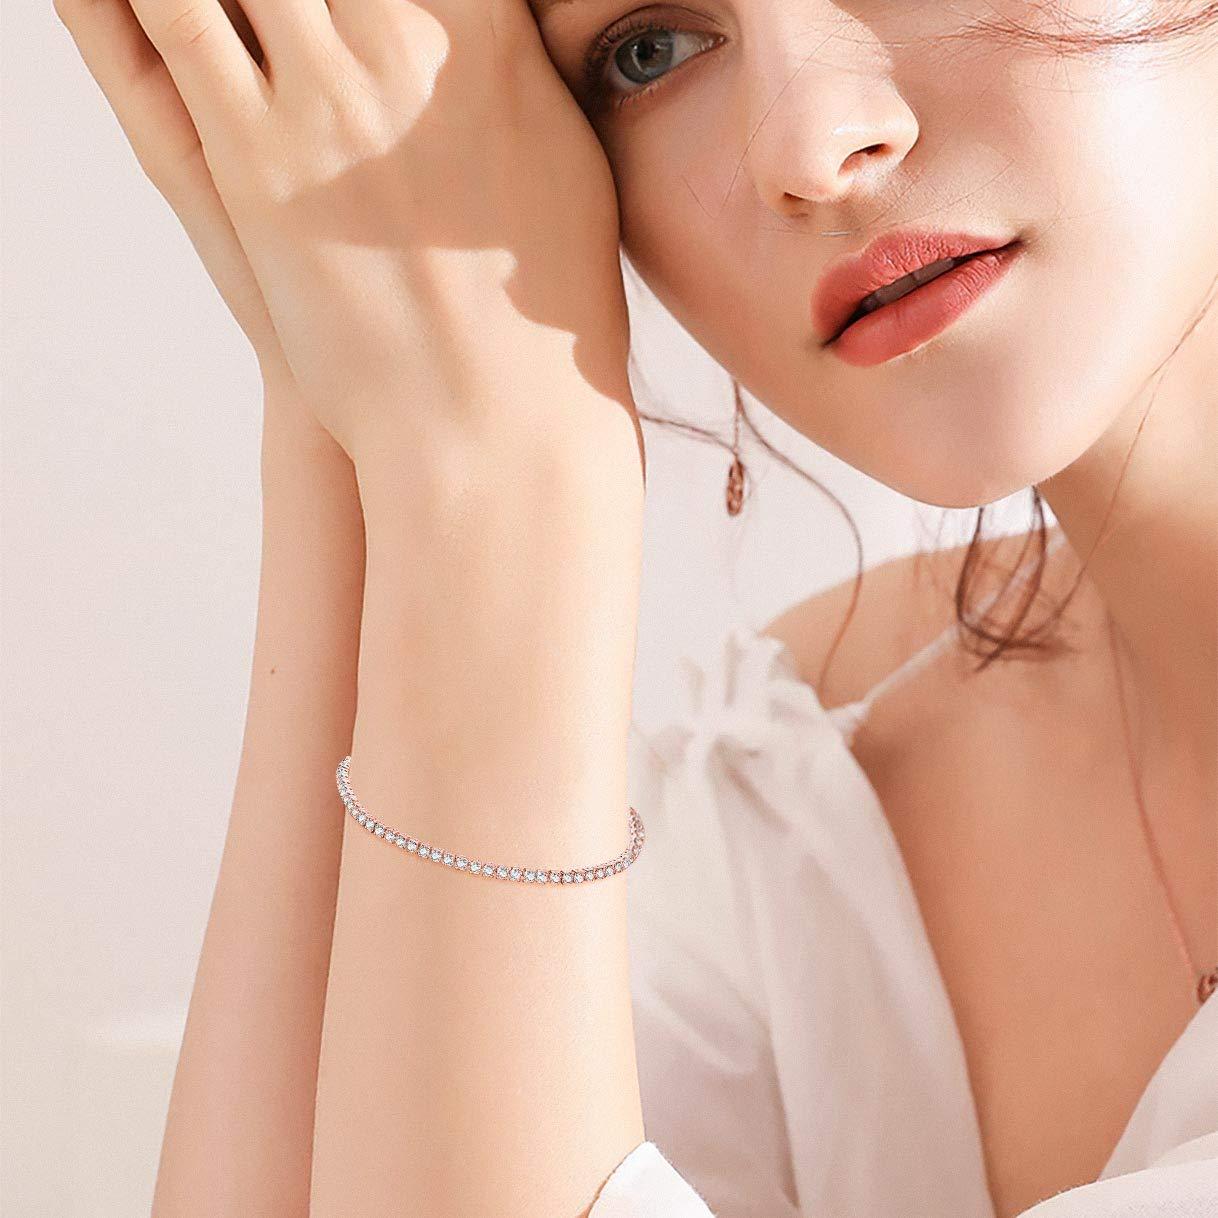 Richapex Womens Platinum Plated Silver Adjustable Cubic Zirconia Slider Tennis Bracelet with Swarovski Crystal